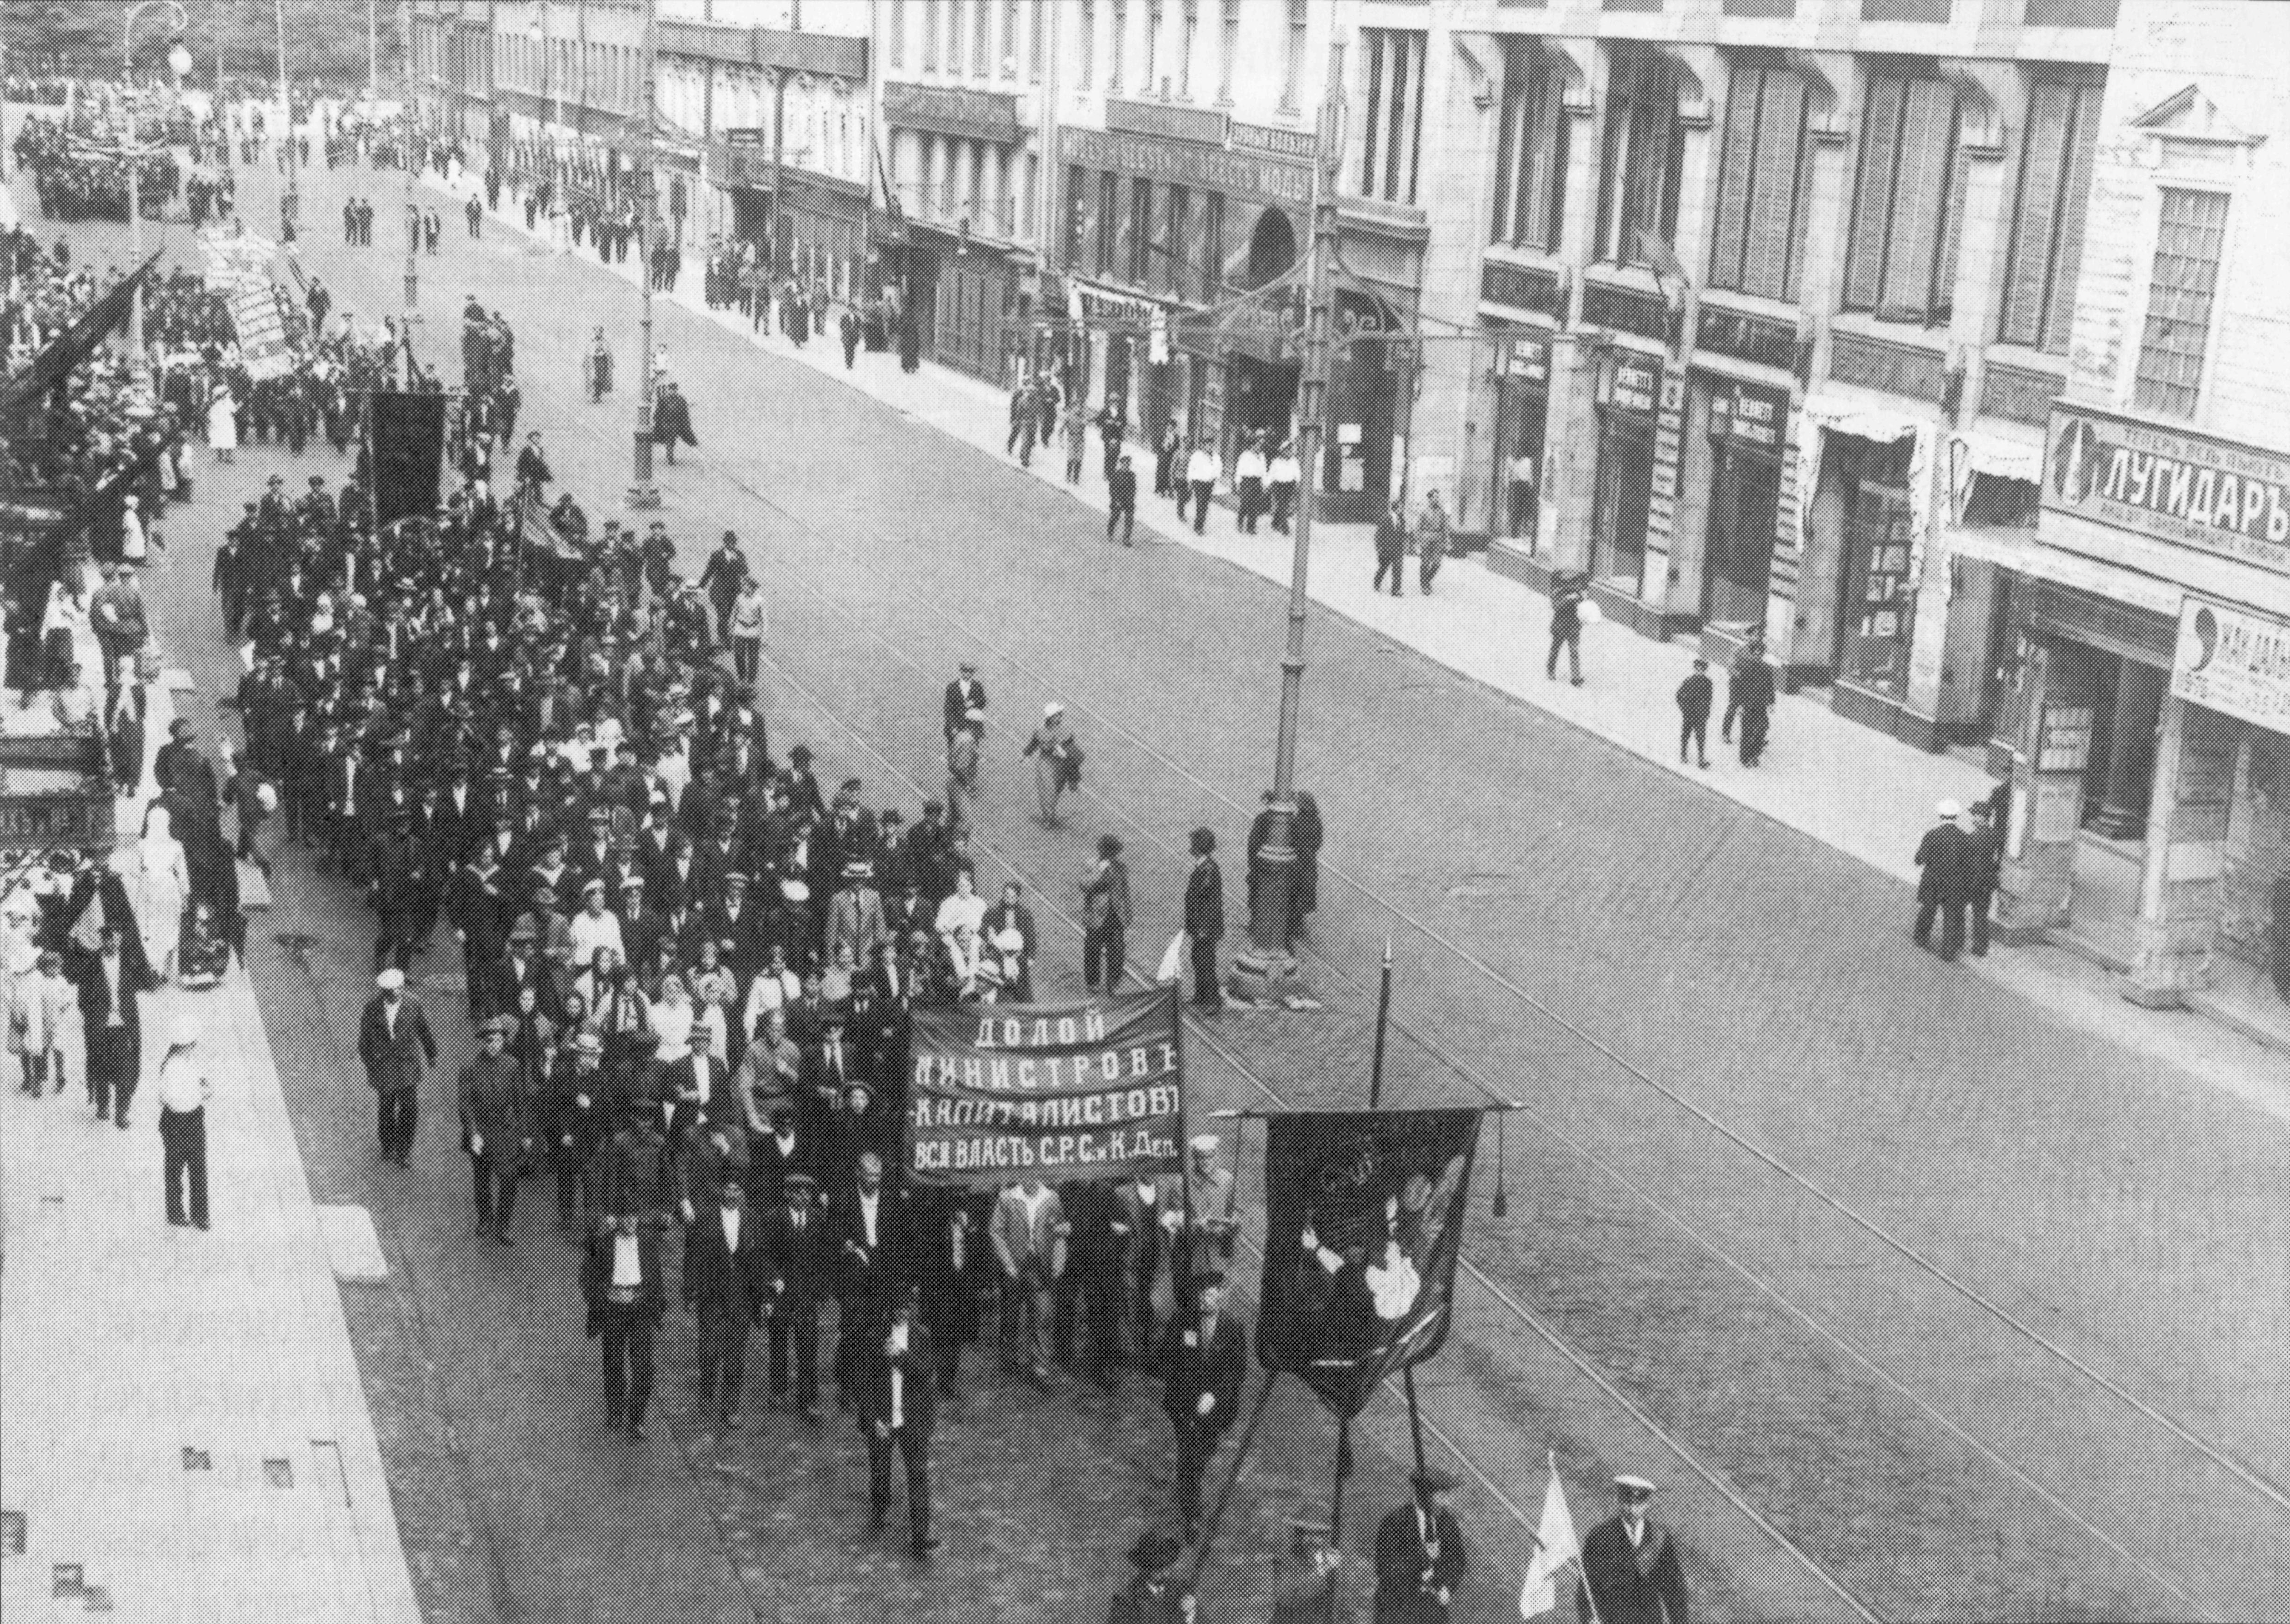 Iyul'skaya_1917_demonstraciya_v_Petrograde[1].jpg